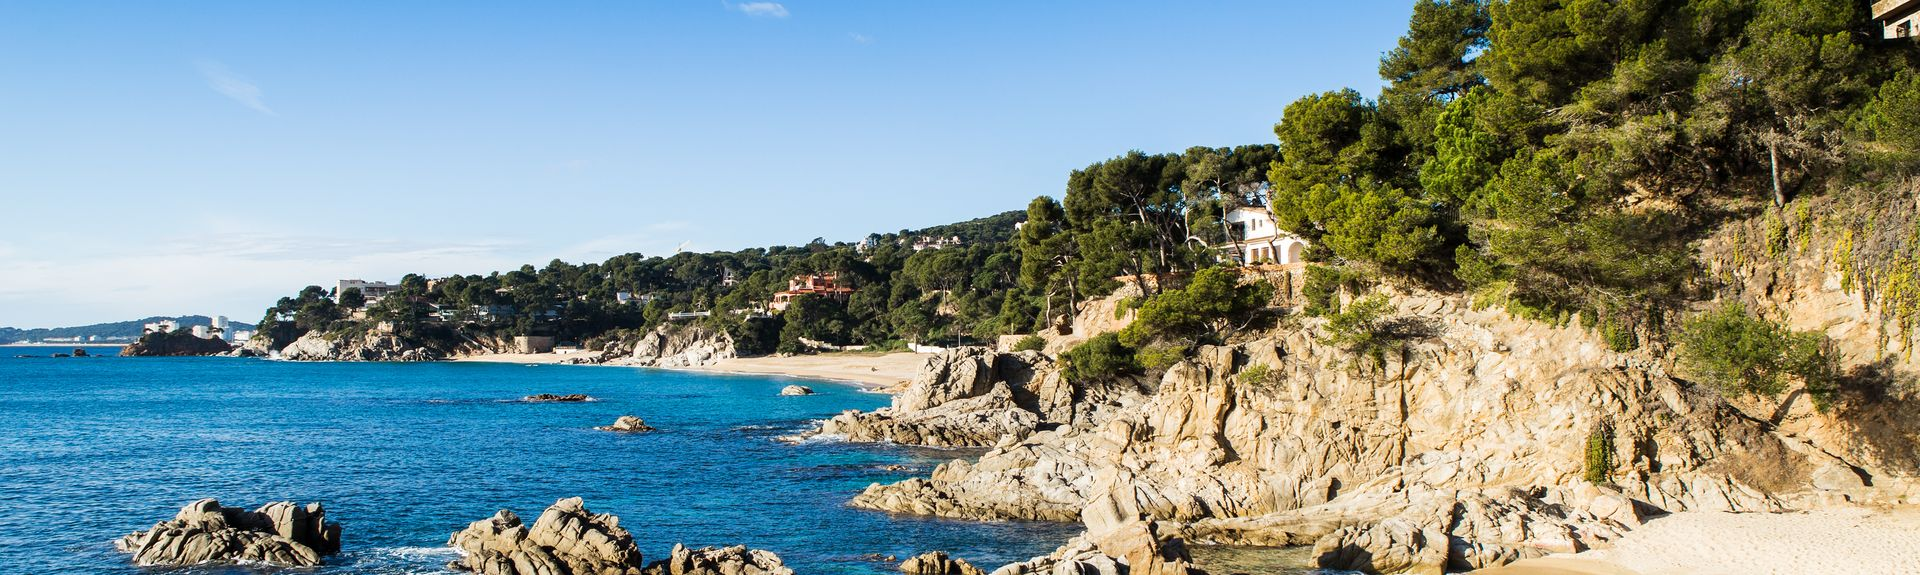 Calonge, Catalogne, Espagne